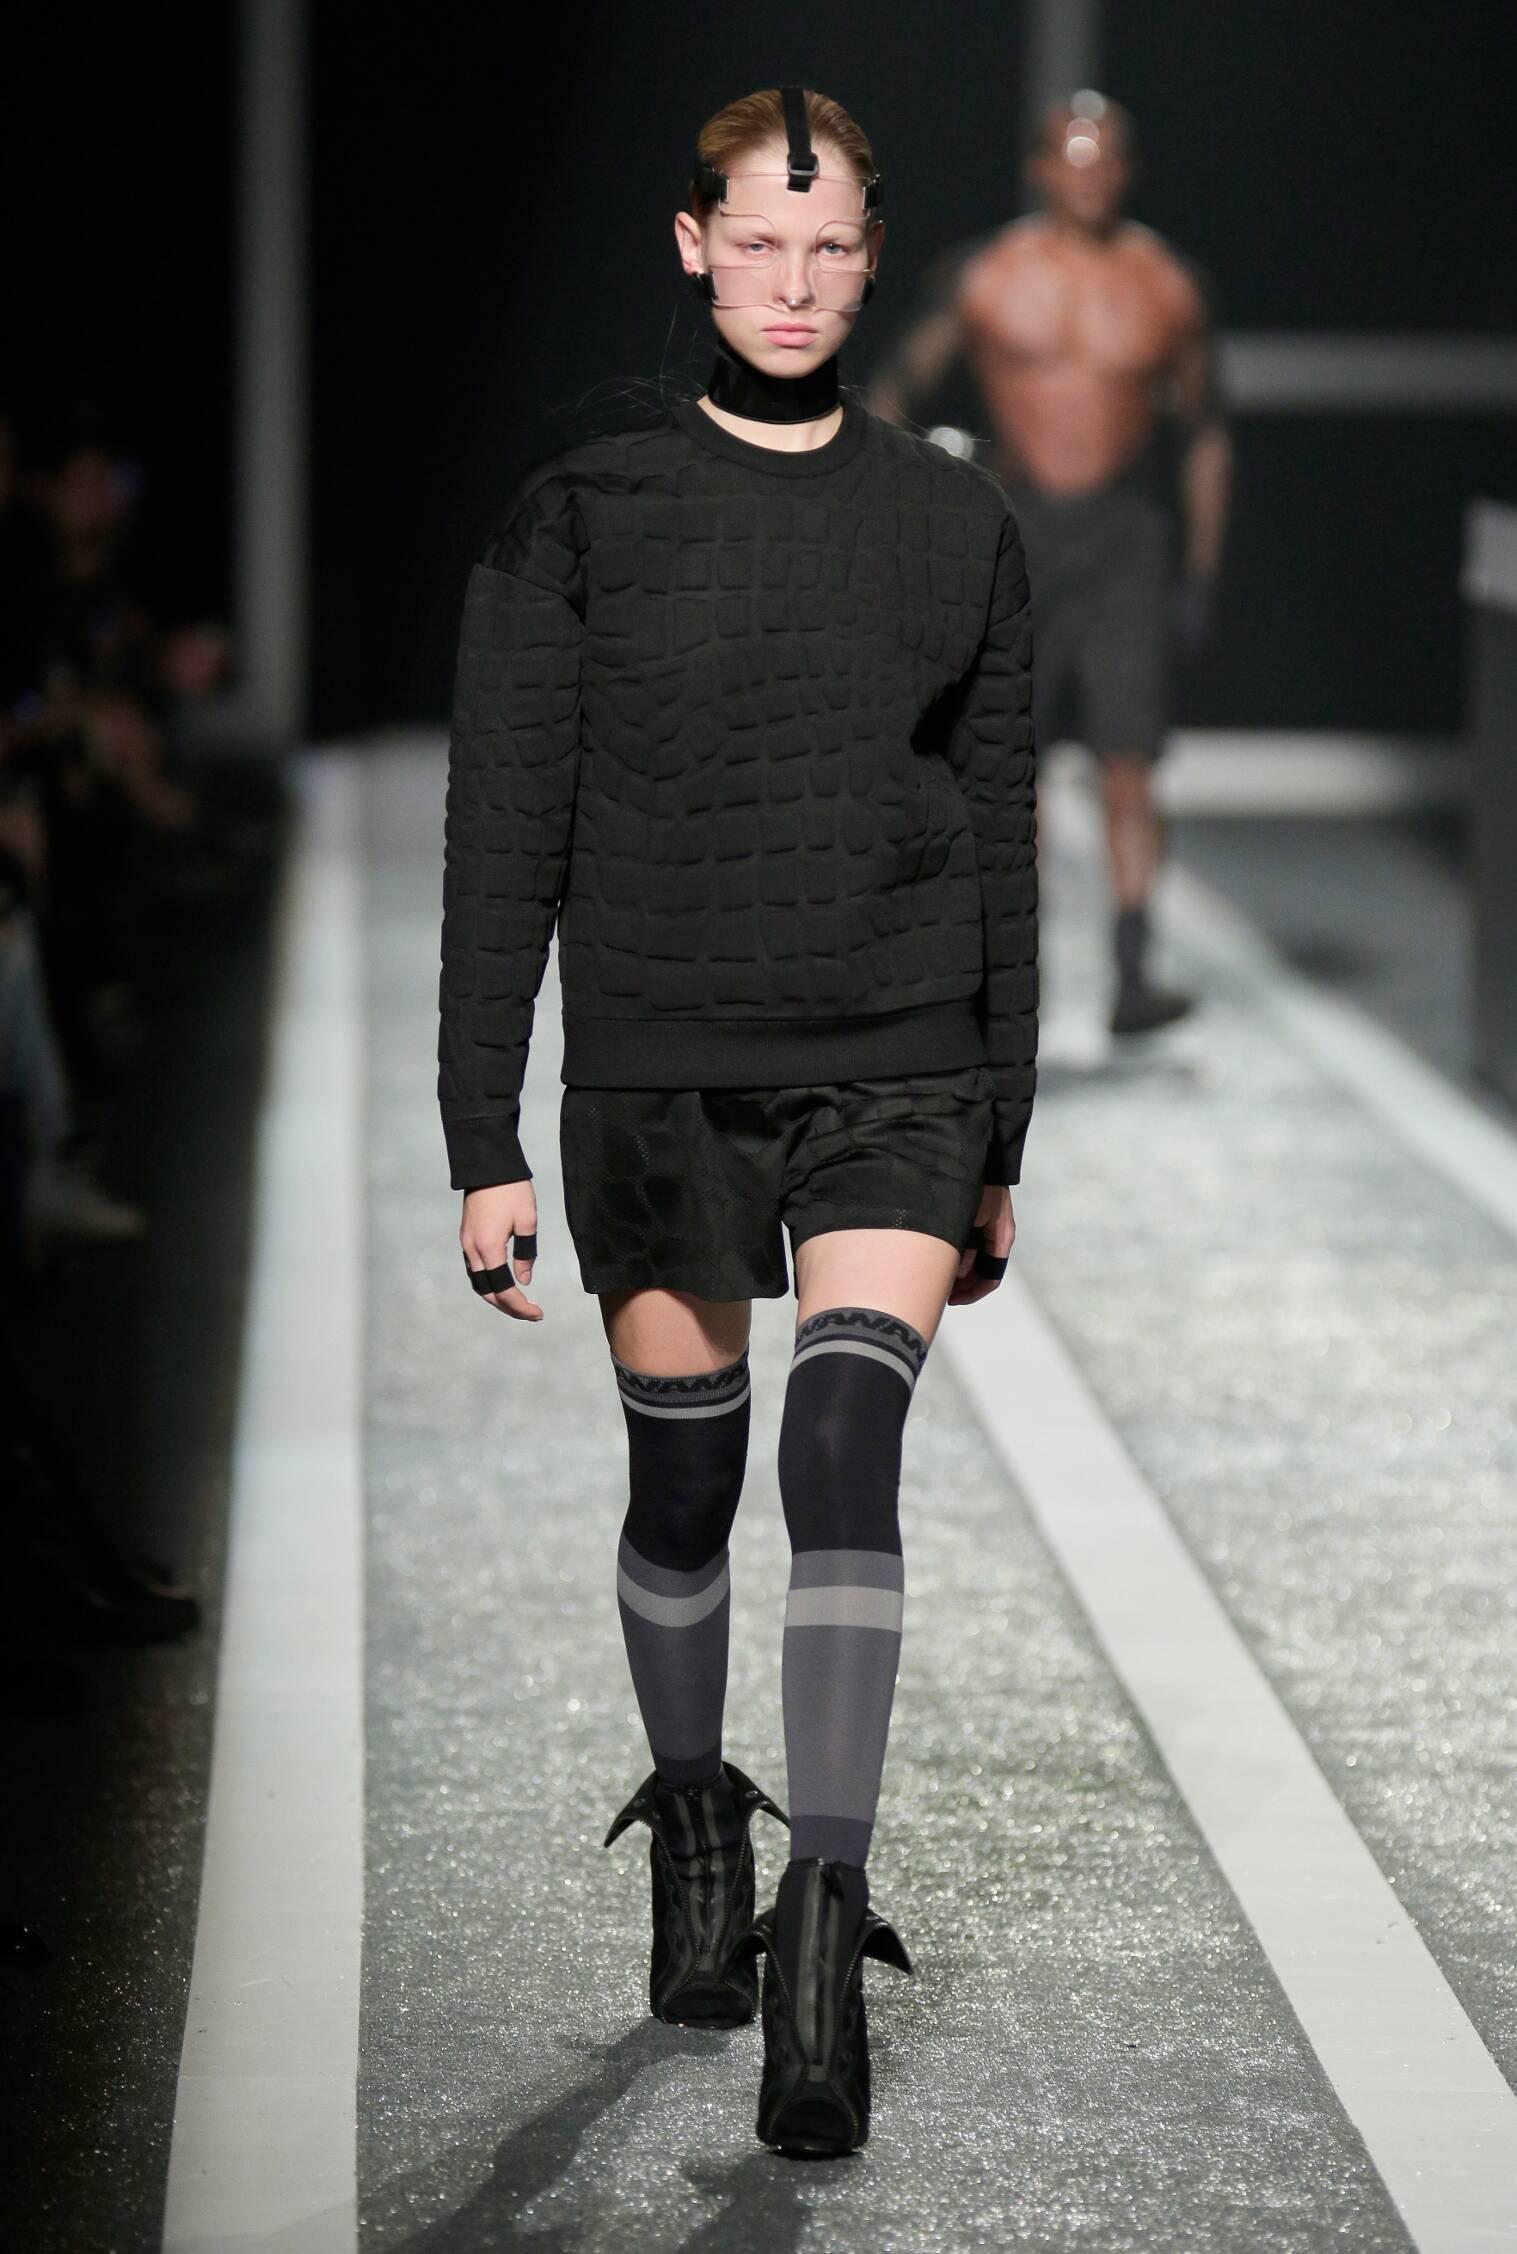 Fashion Woman Model Alexander Wang for H&M Runway